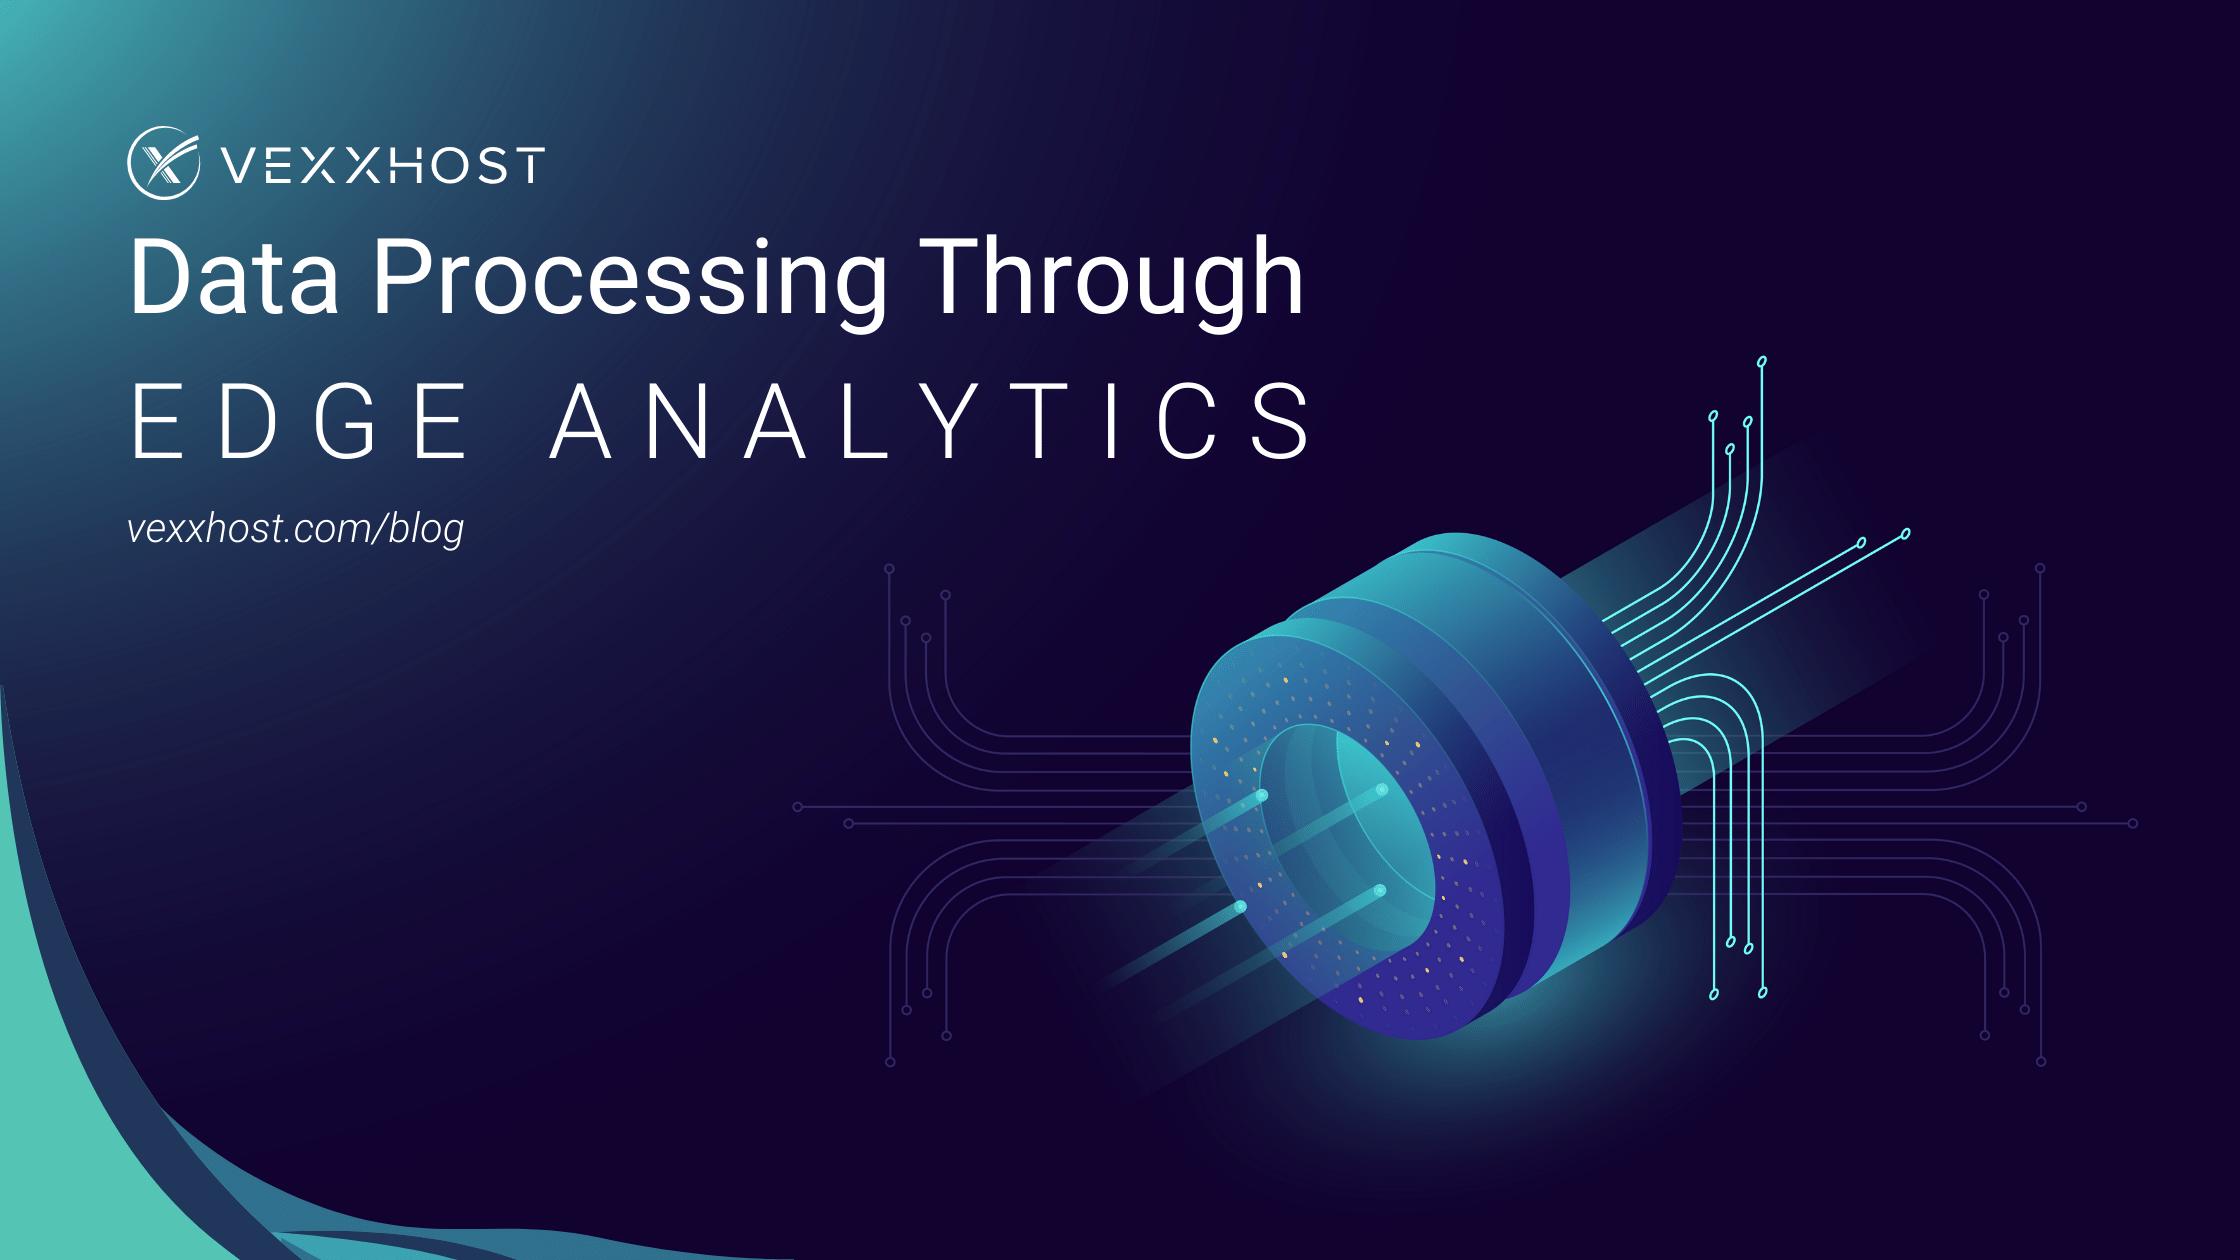 Data Processing Through Edge Analytics